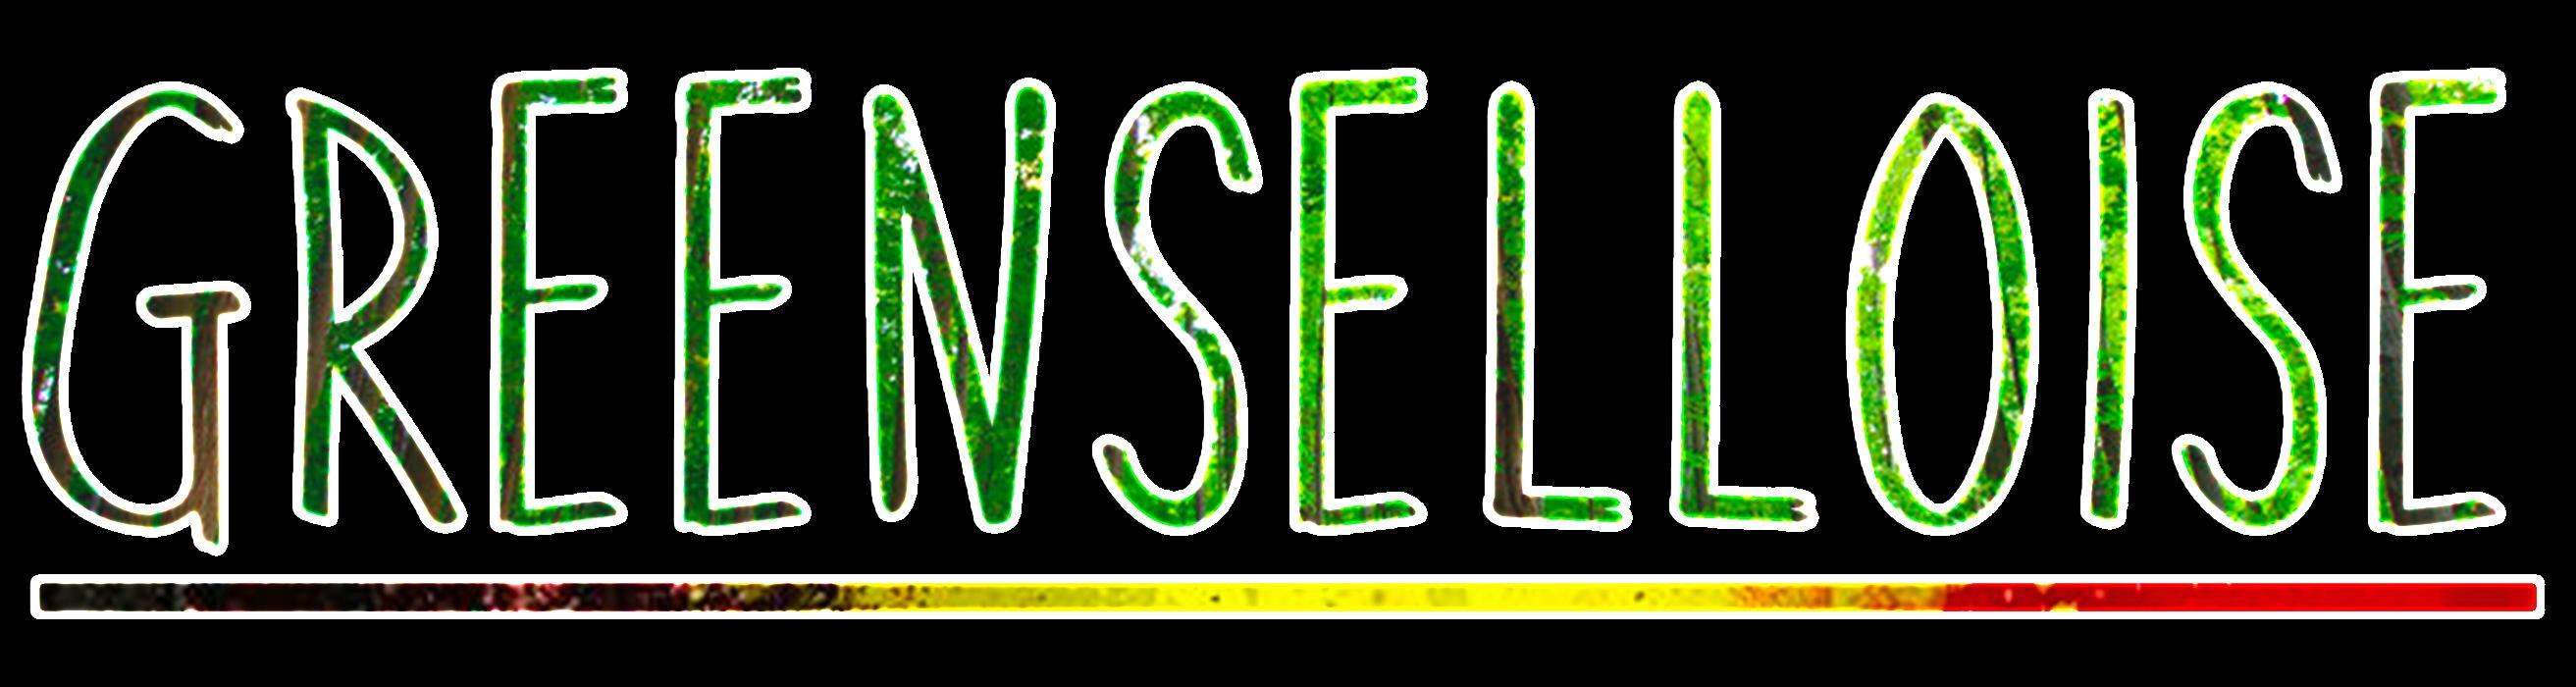 Greenselloise